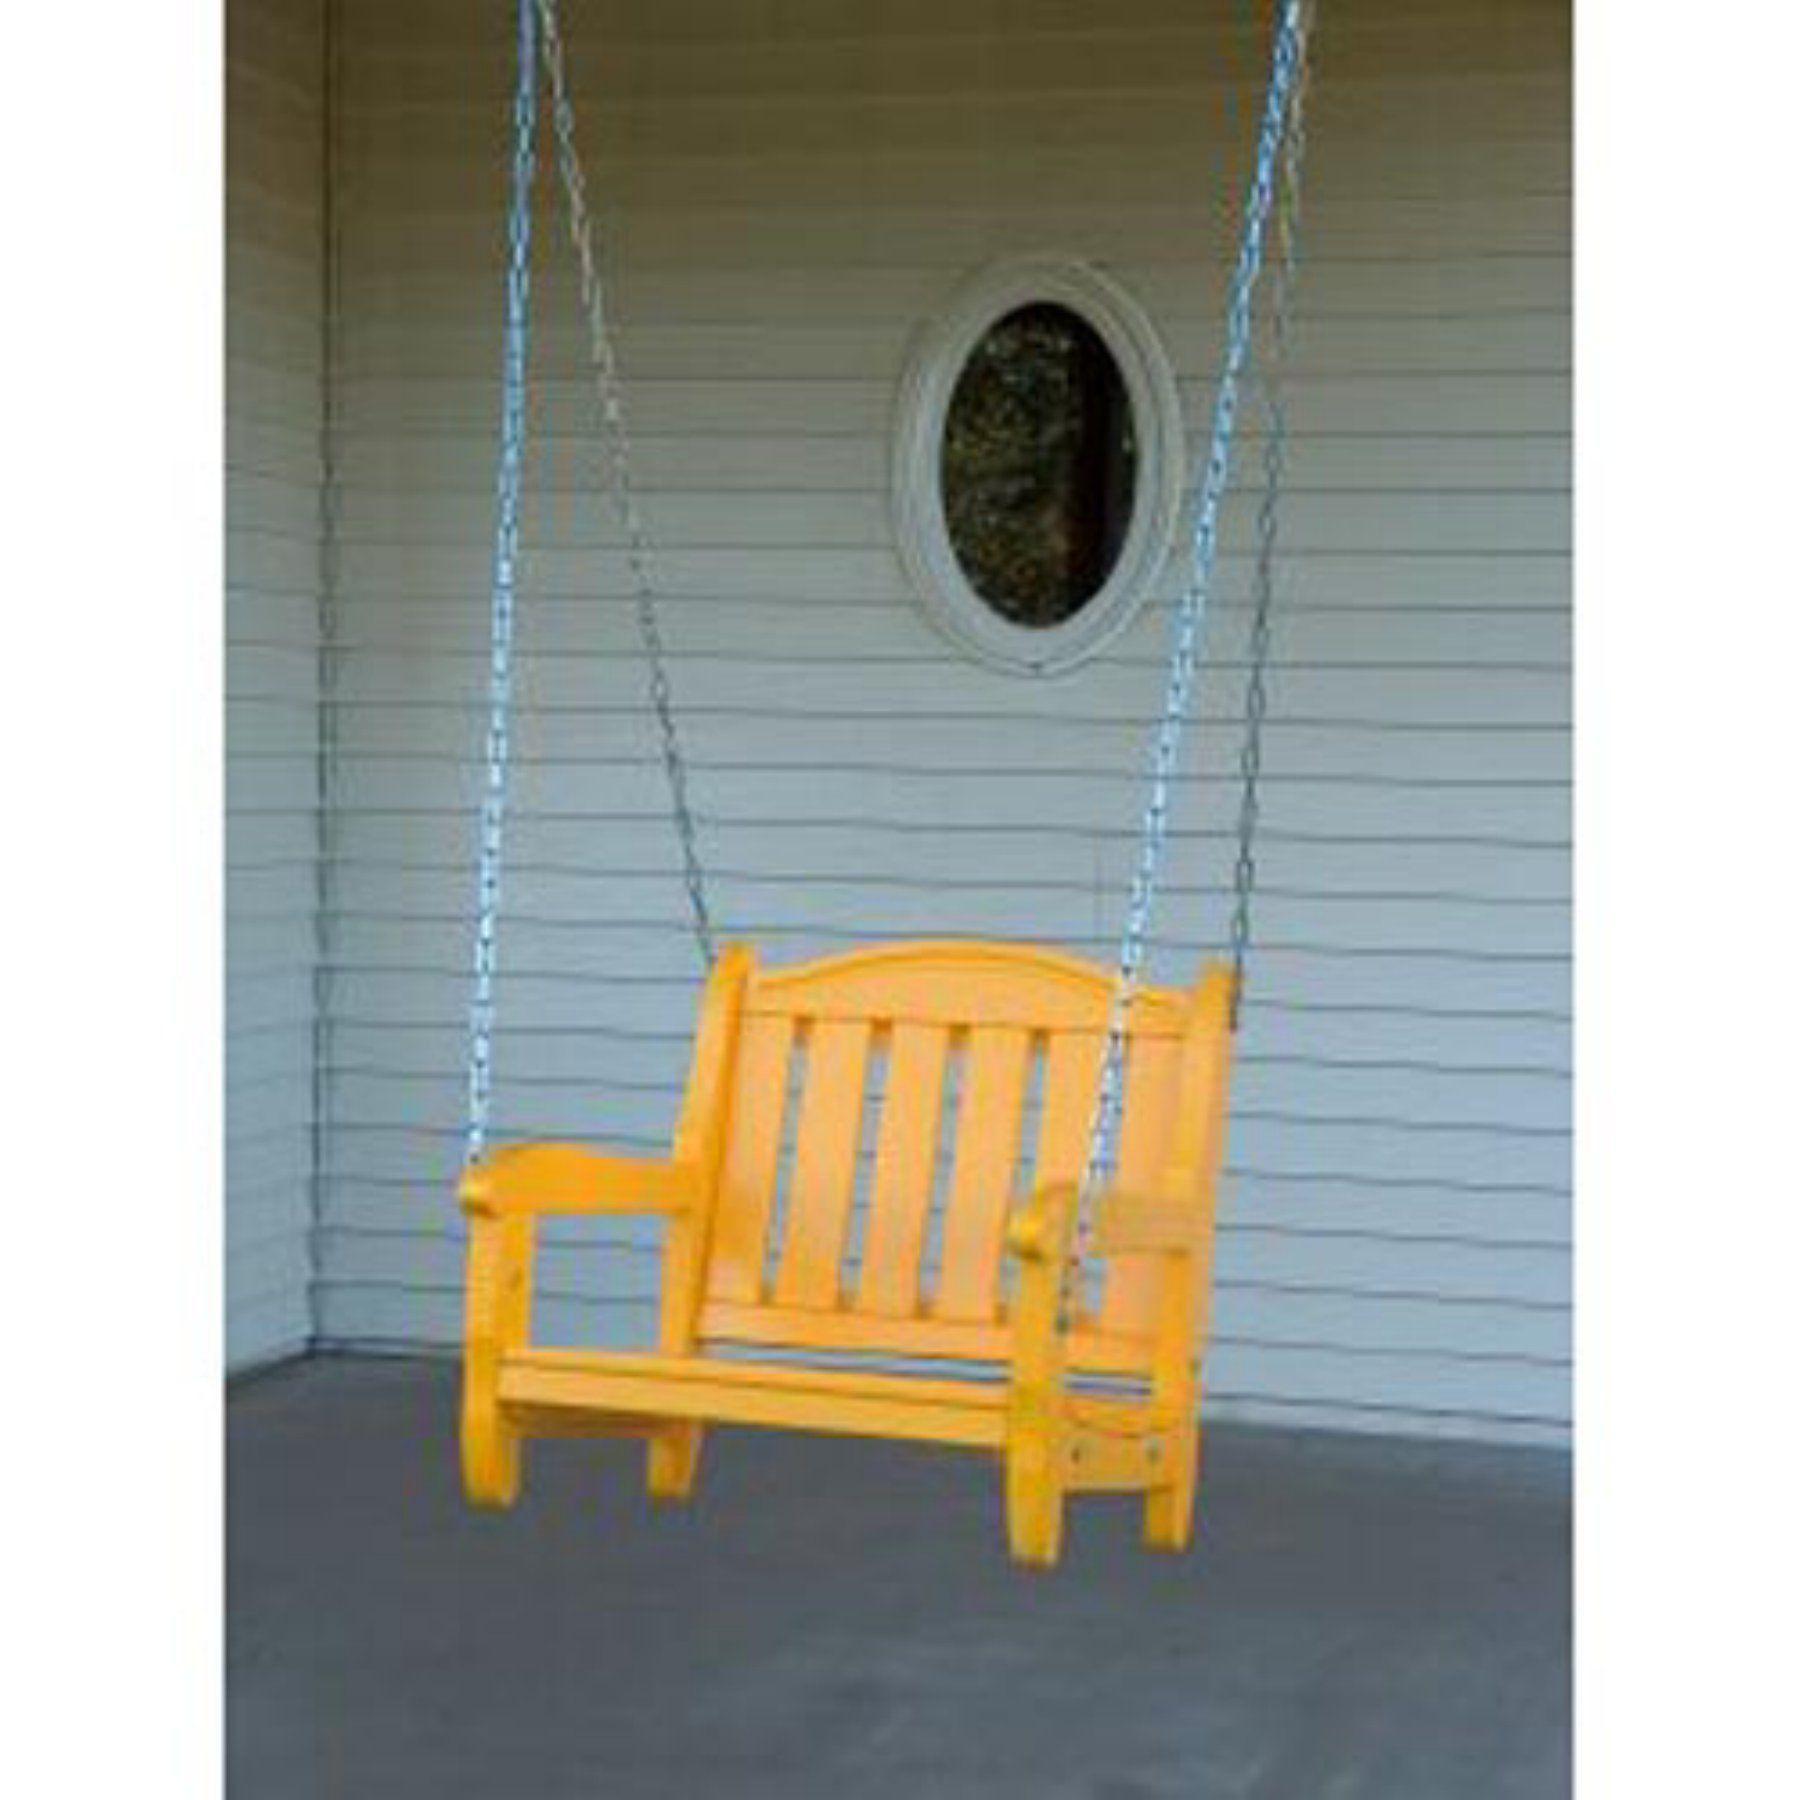 Prairie leisure garden chair ft single person porch swing